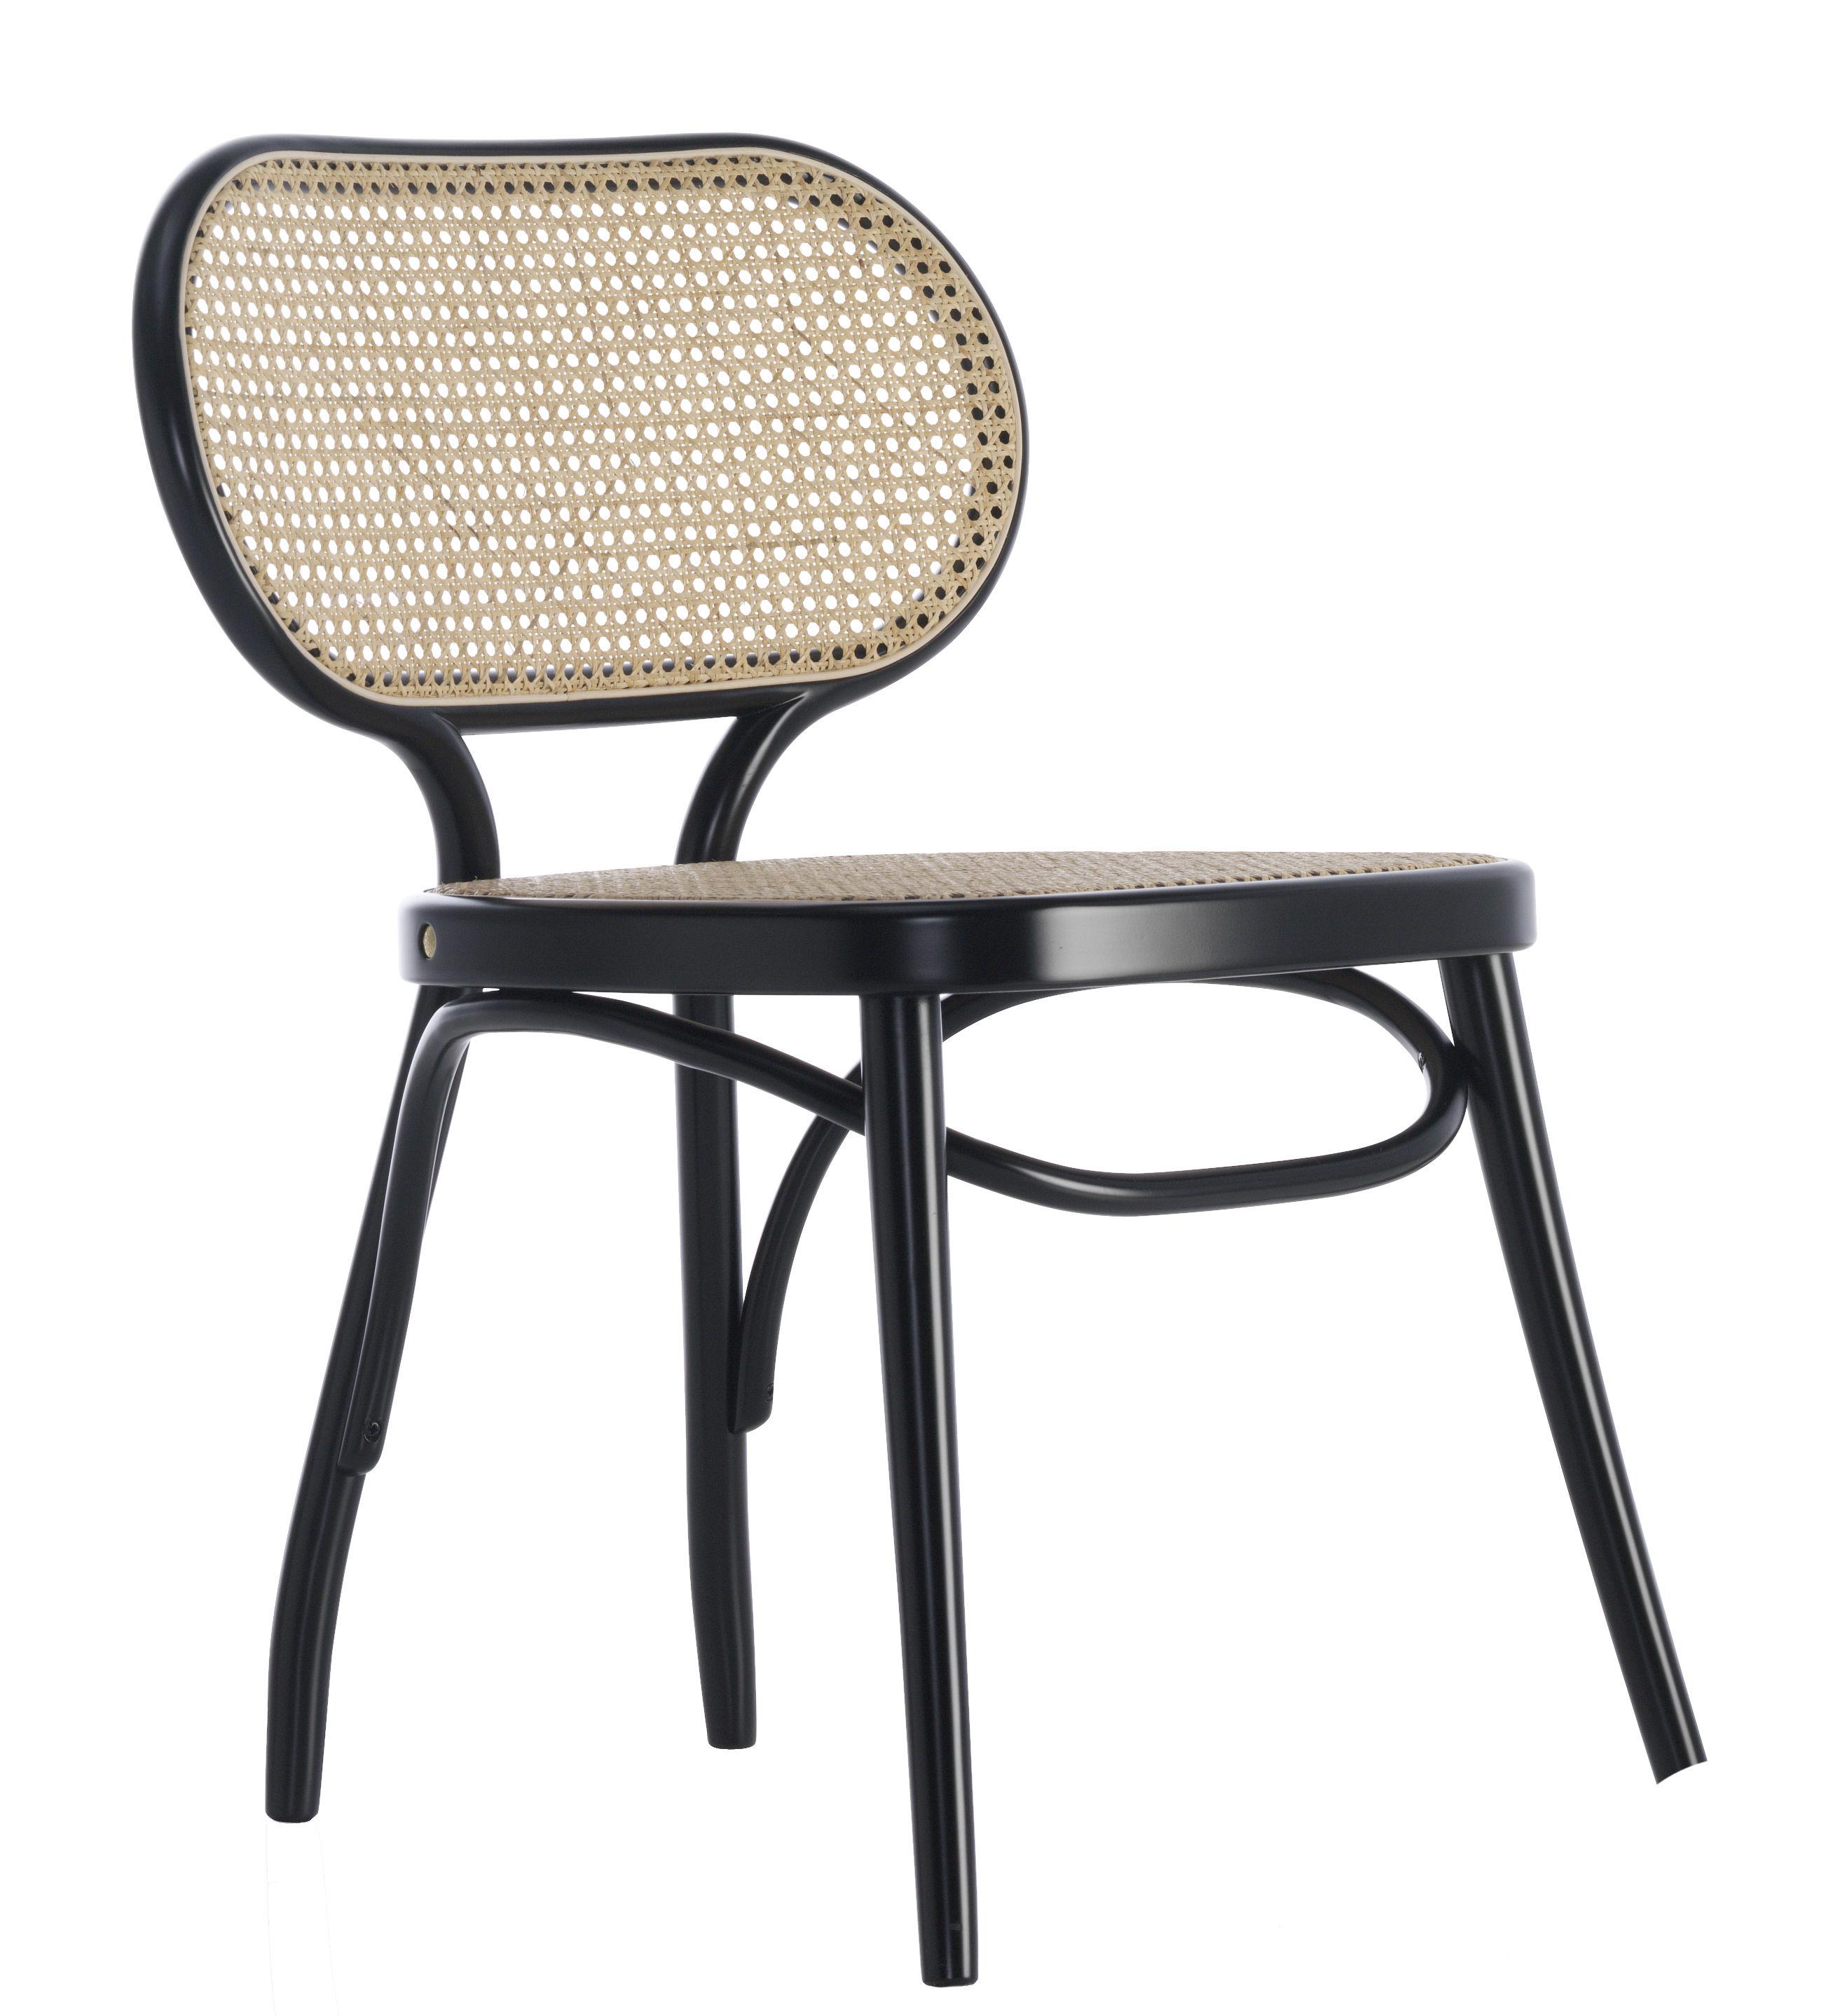 Furniture - Chairs - Bodystuhl Chair - / Wood & teak by Wiener GTV Design - Black / Natural straw - Curved solid beechwood, Straw